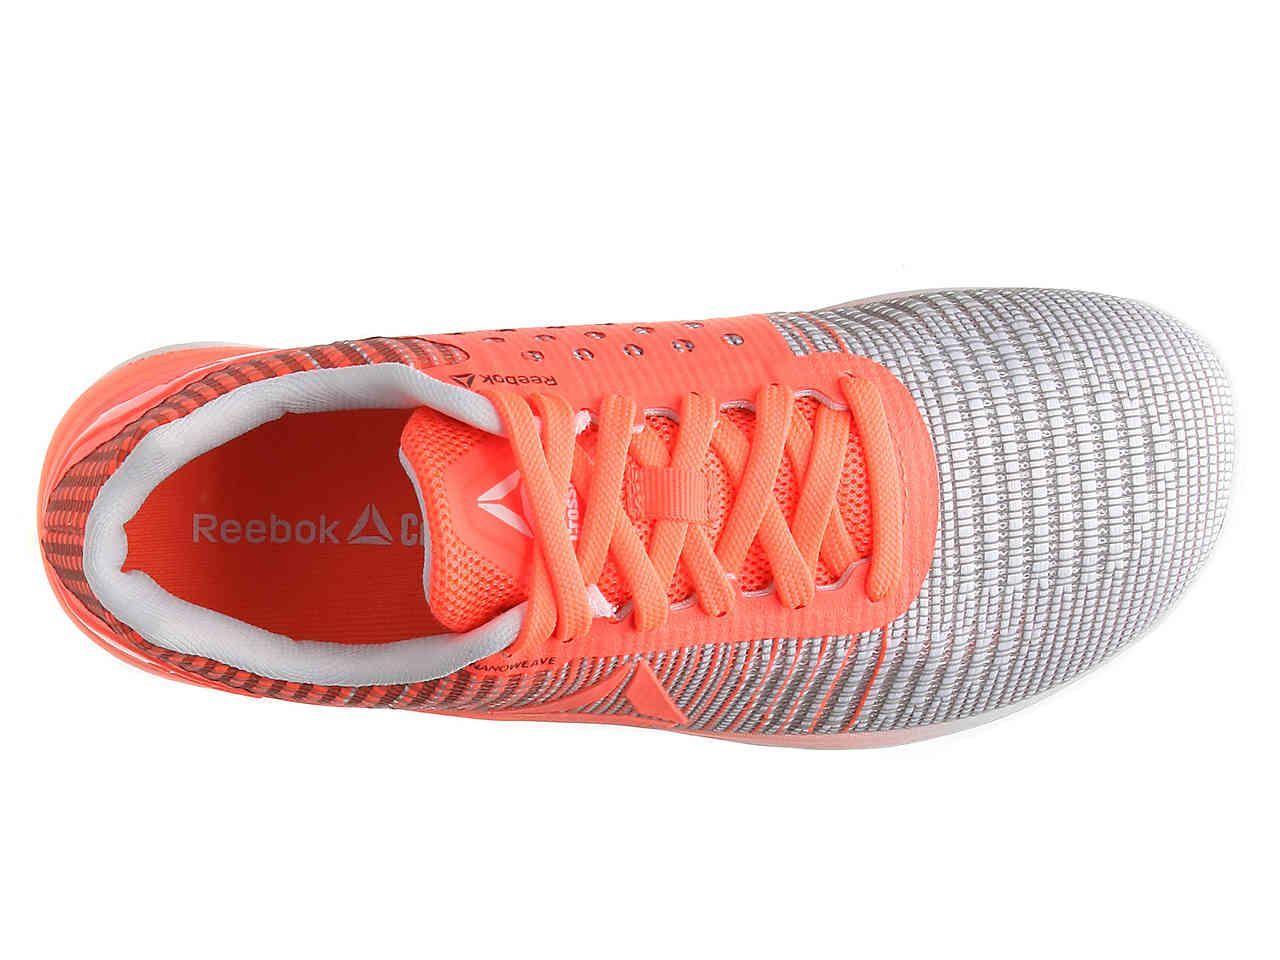 Reebok Crossfit Nano 7 Training Shoe